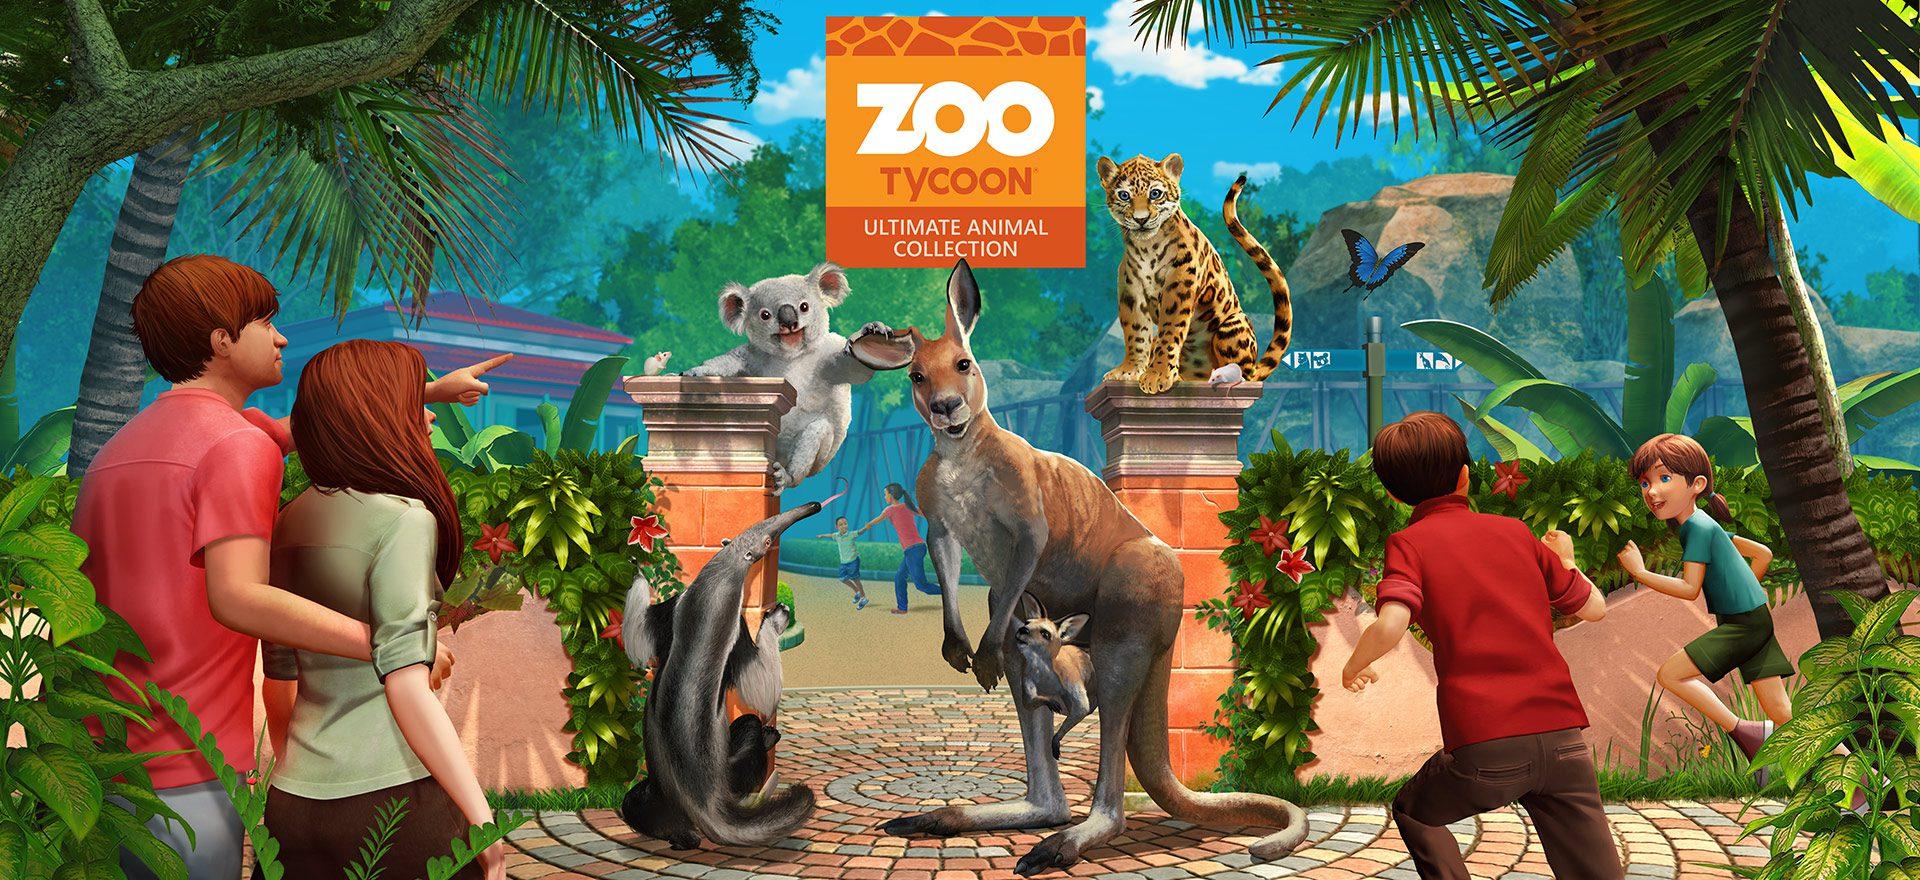 Baixar zoo tycoon 3 completo gratis